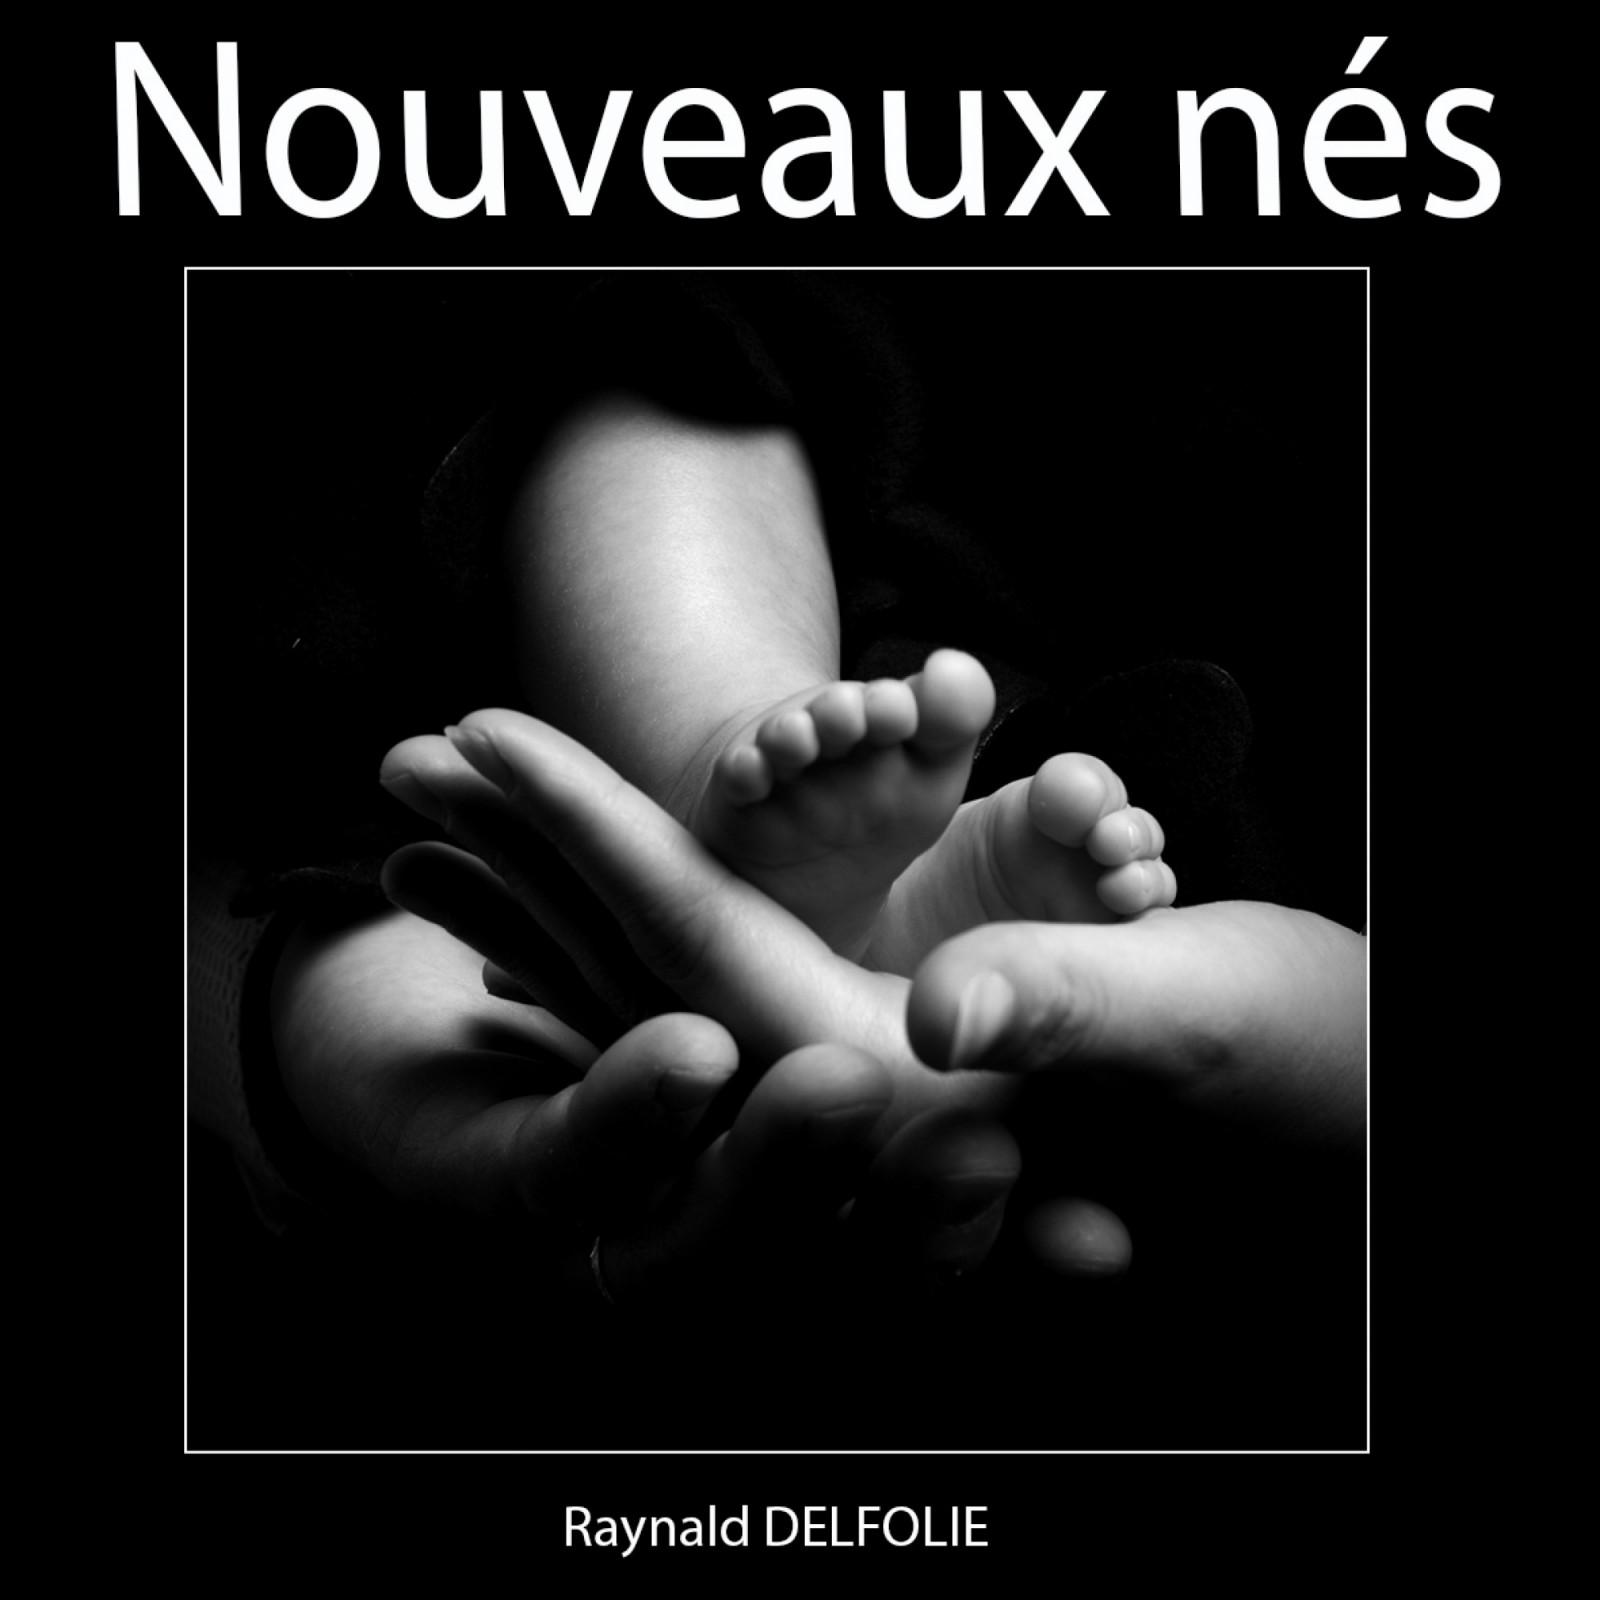 raynald-delfolie 950454a10b7c